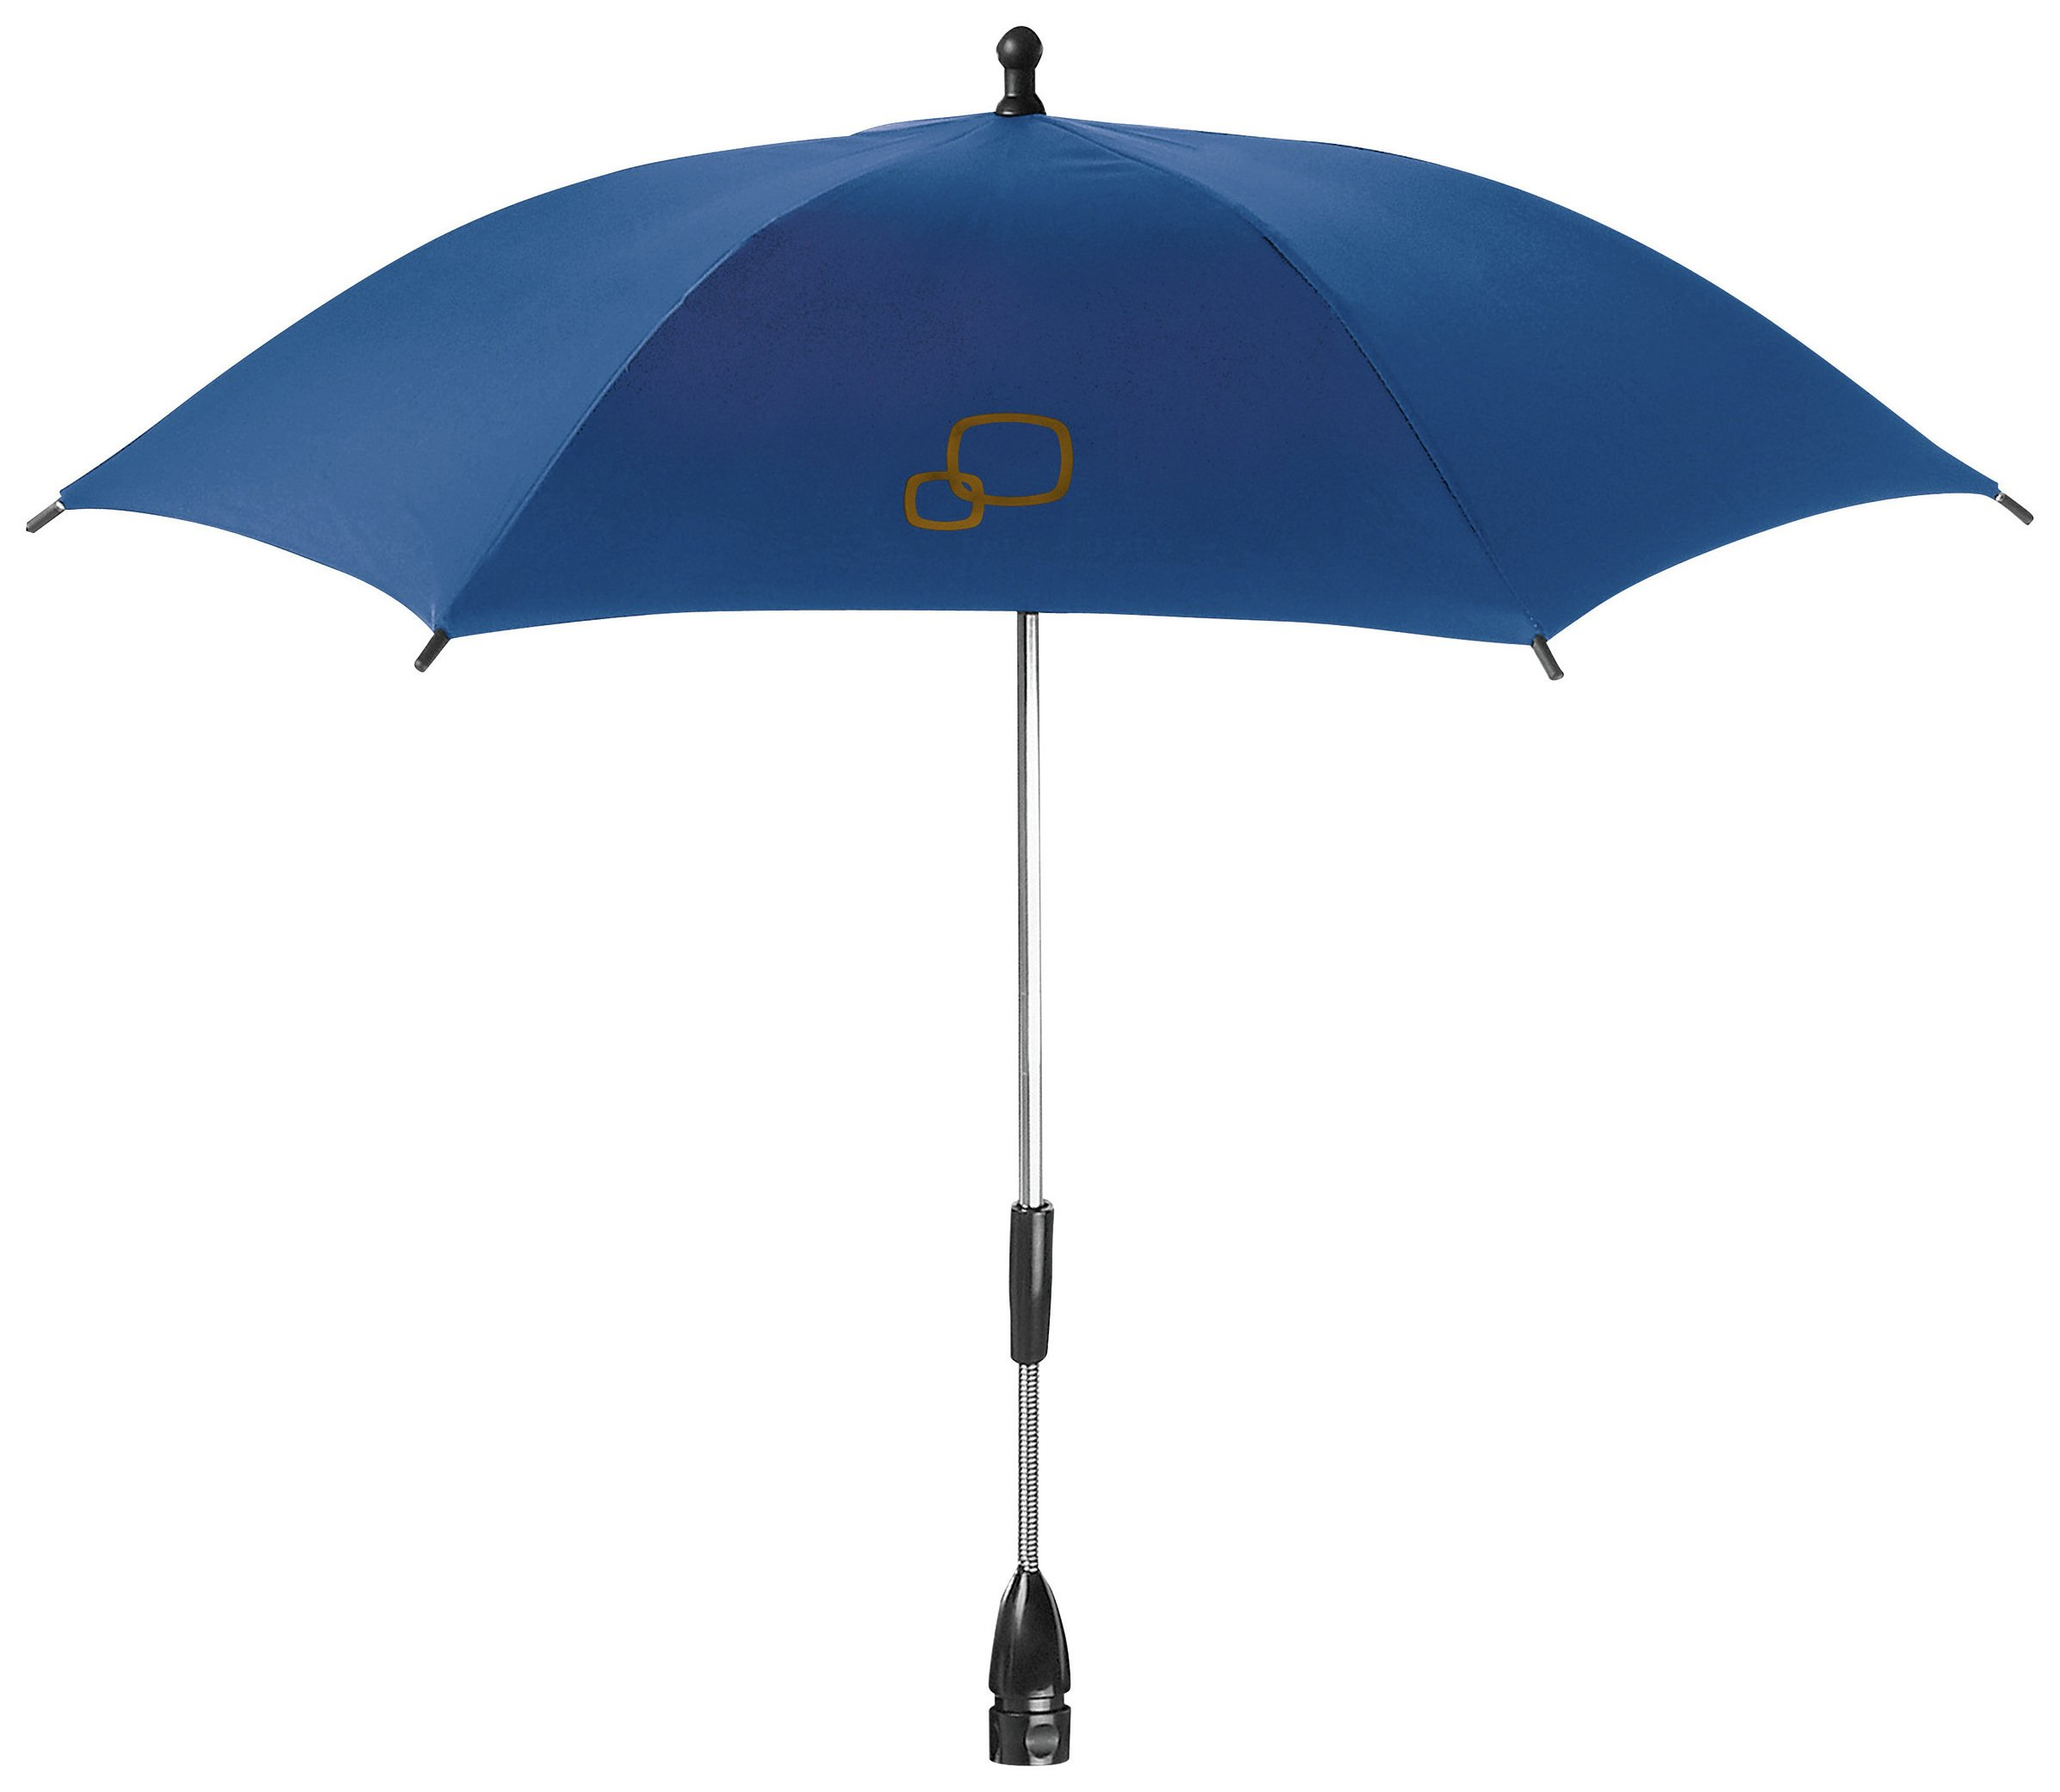 Quinny Parasol - Blue Base